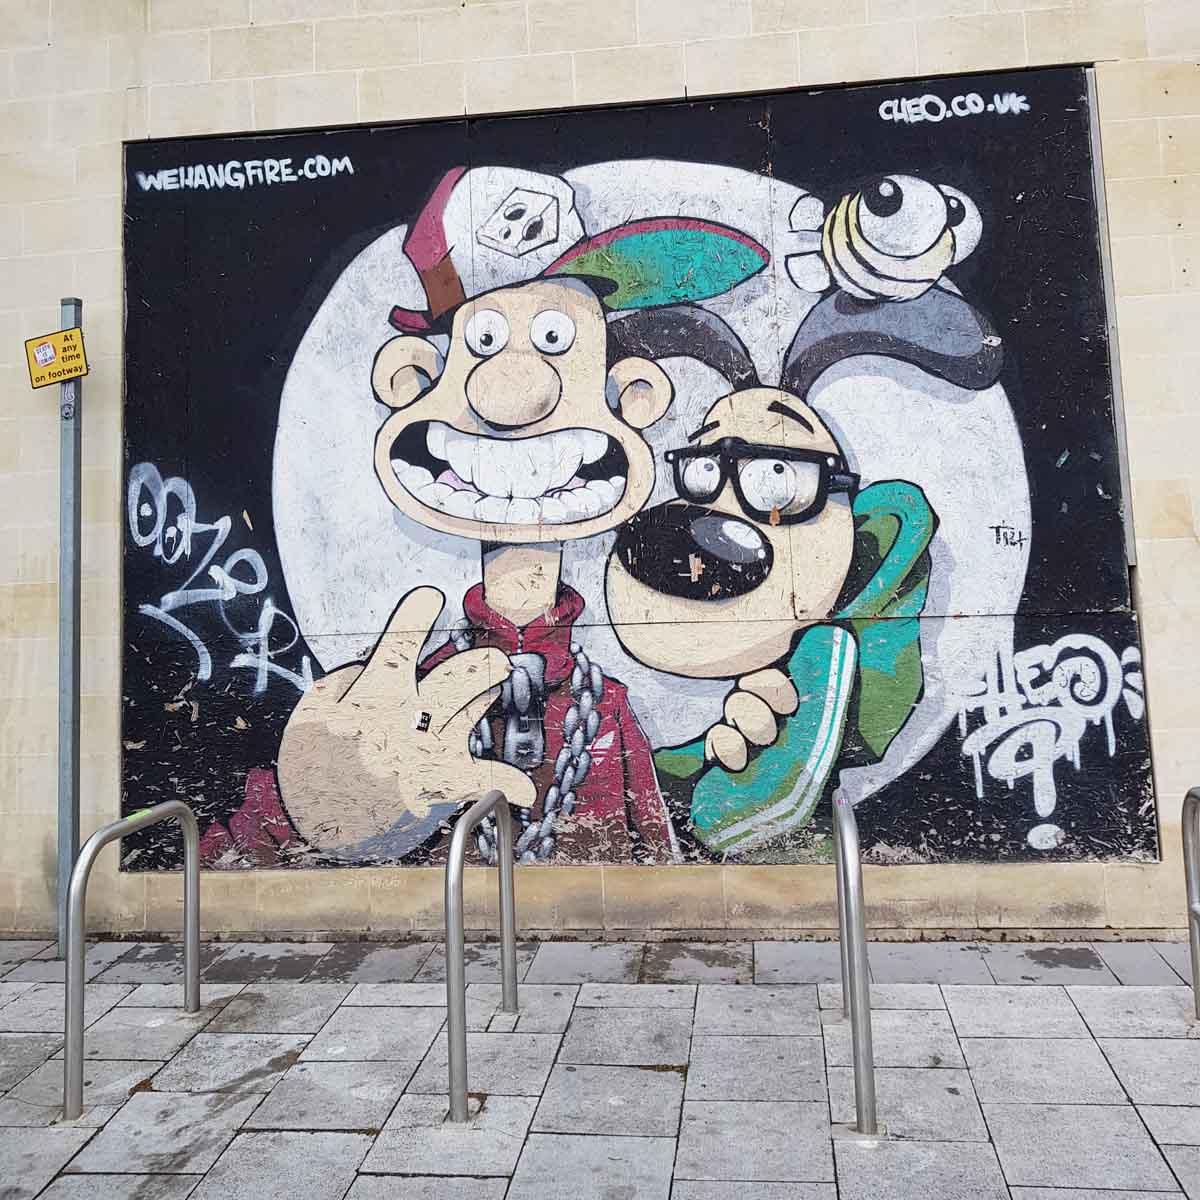 Street art bristol, De leukste dingen om te doen in Bristol - Map of Joy